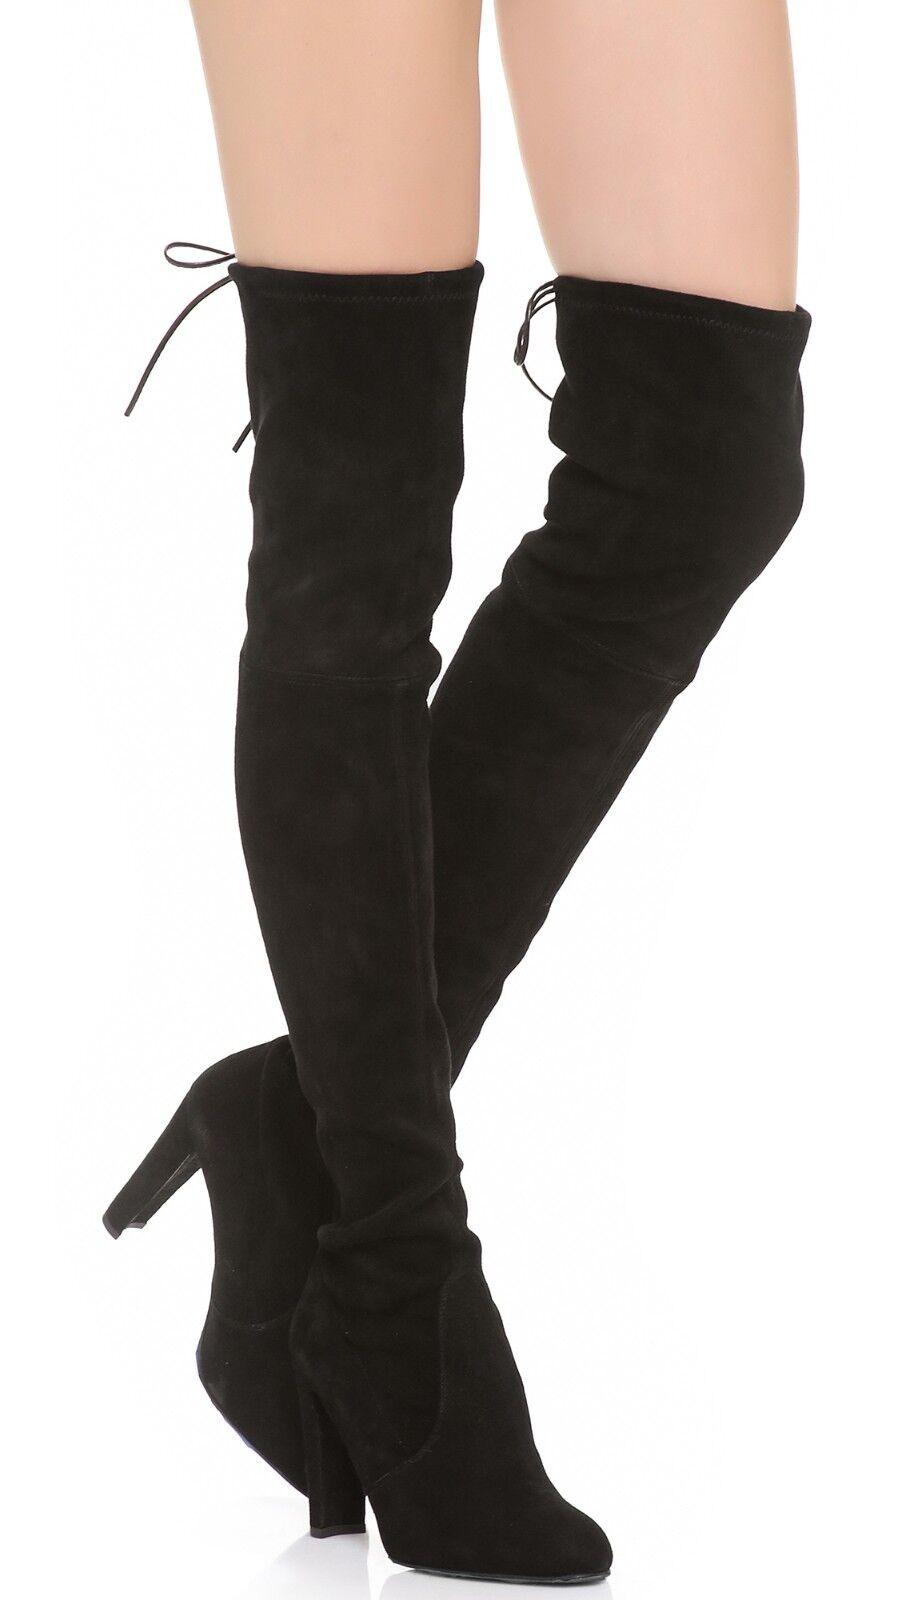 798.00 Stuart Weitzman Highland Over-the-knee Boot Size 9